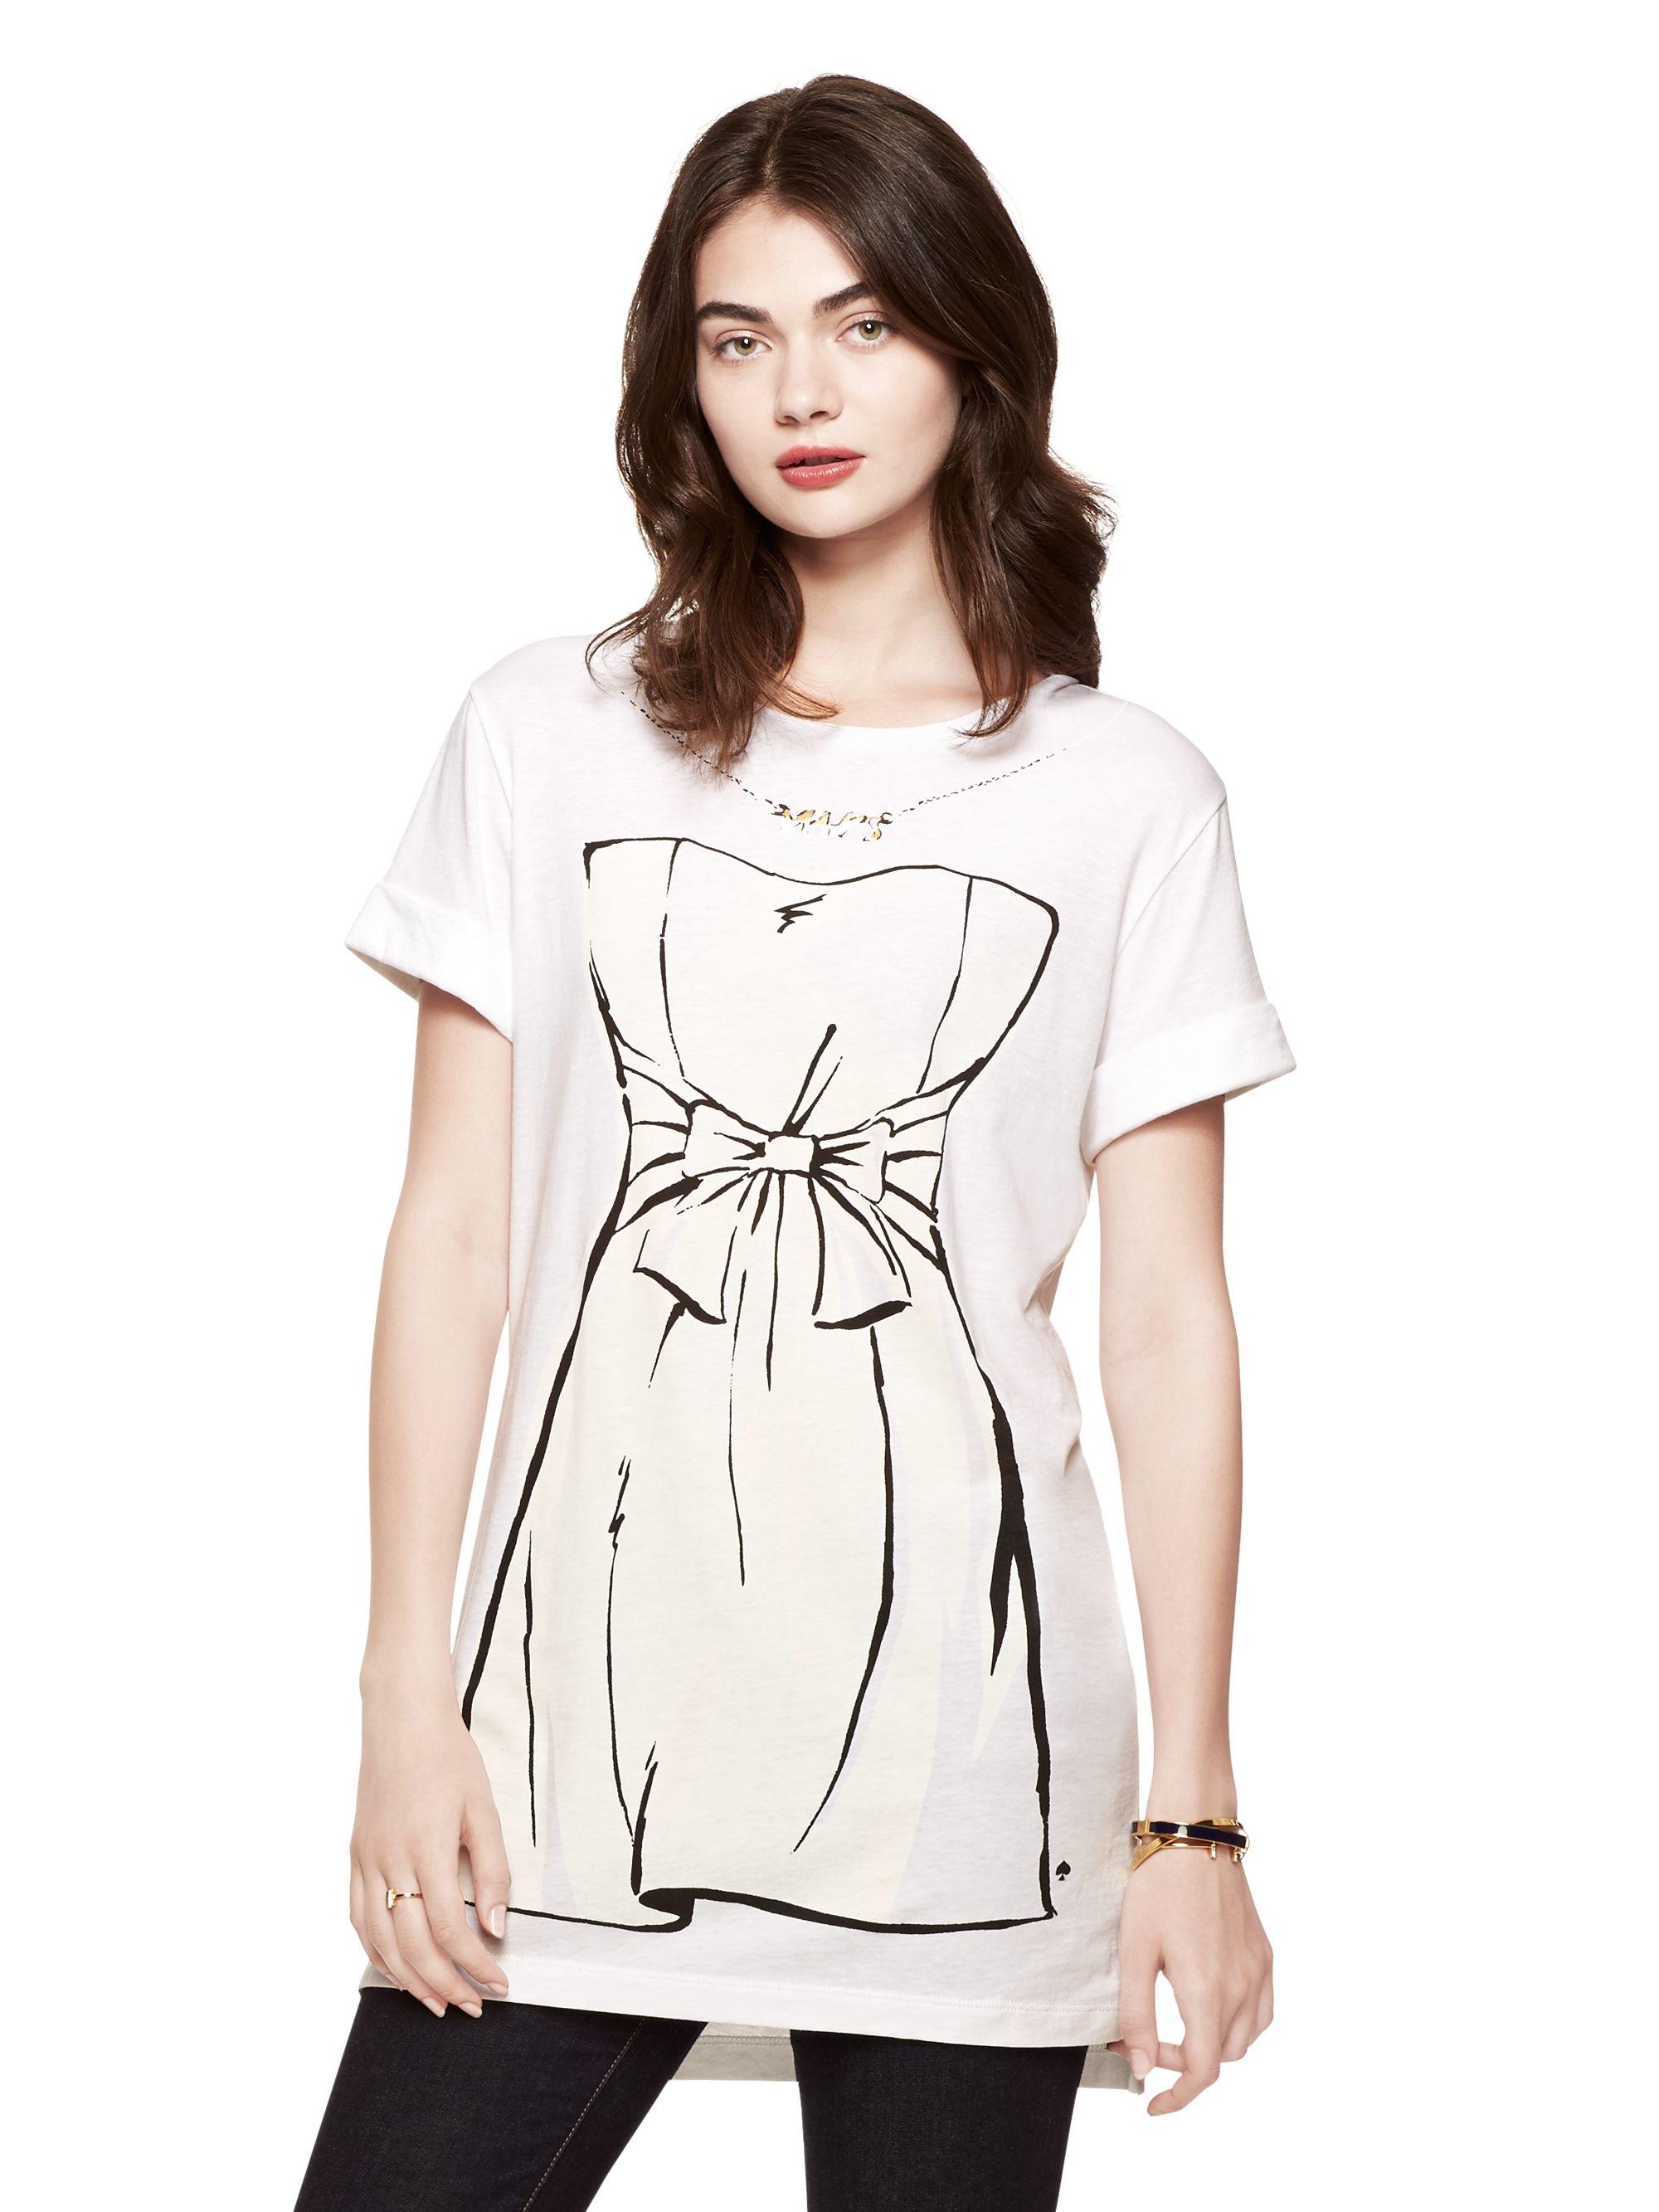 734f7f9384c Kate Spade Wedding Dress Tunic in White - Lyst